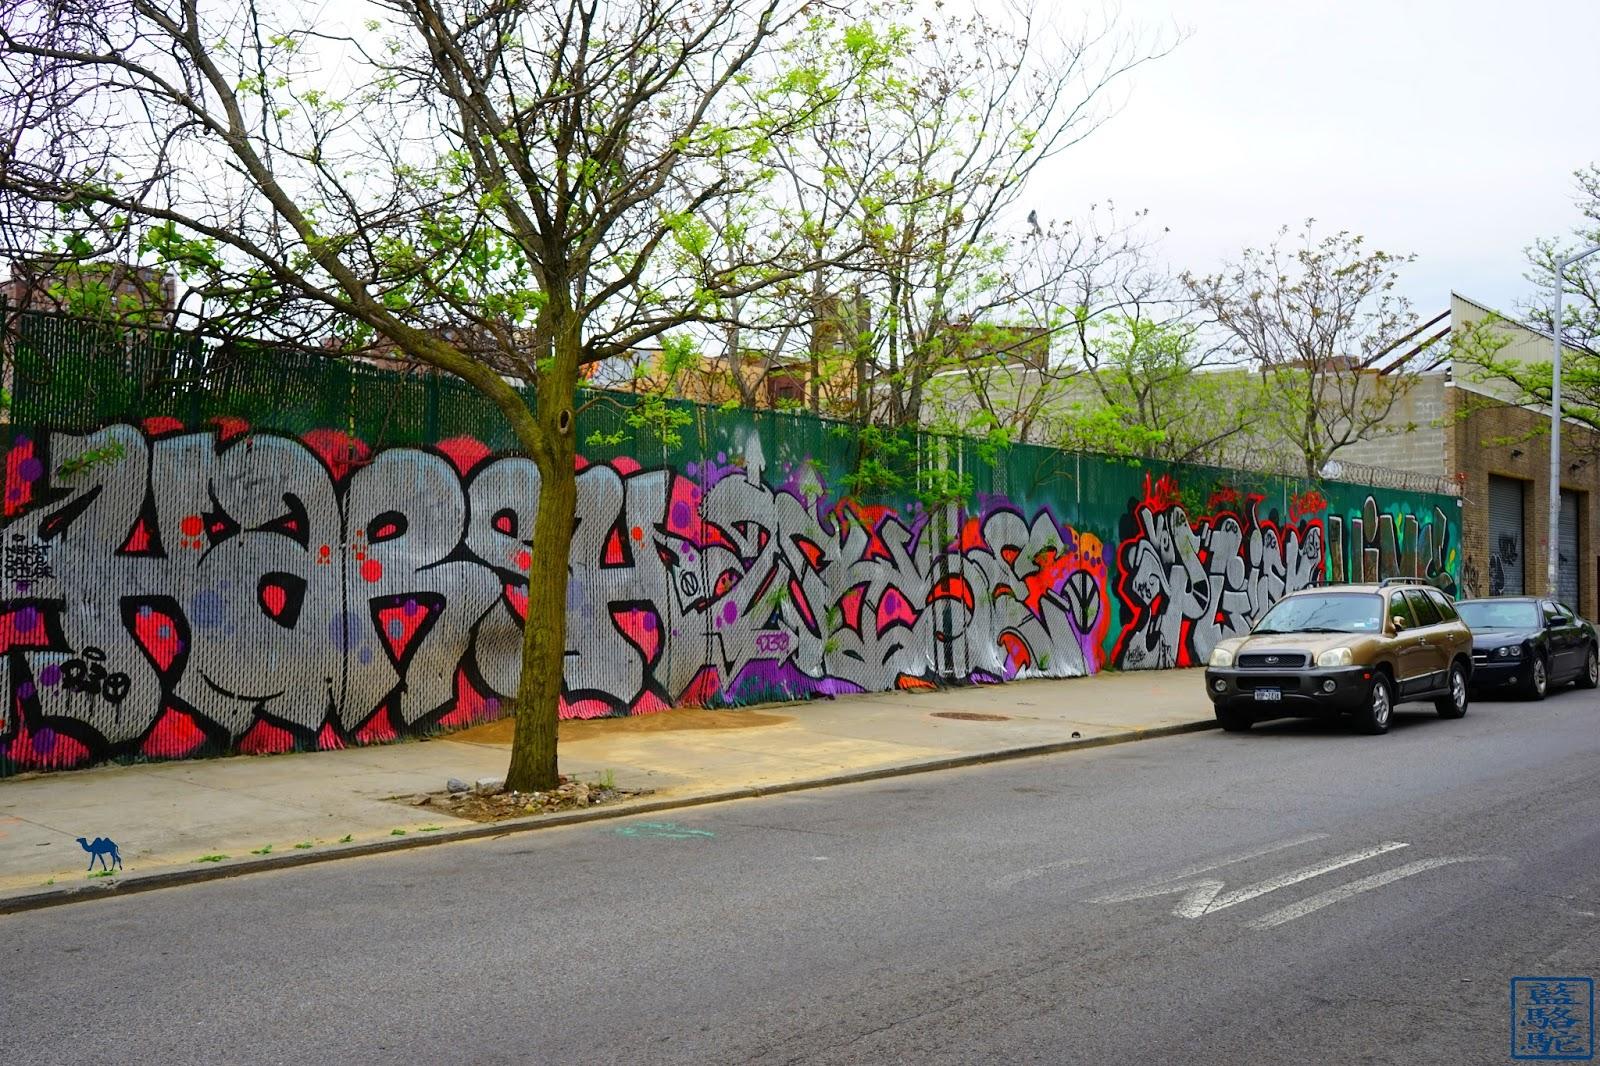 Le Chameau Bleu - Street Art Bushwick 2017 - Graf - Promenade dans Brooklyn New York